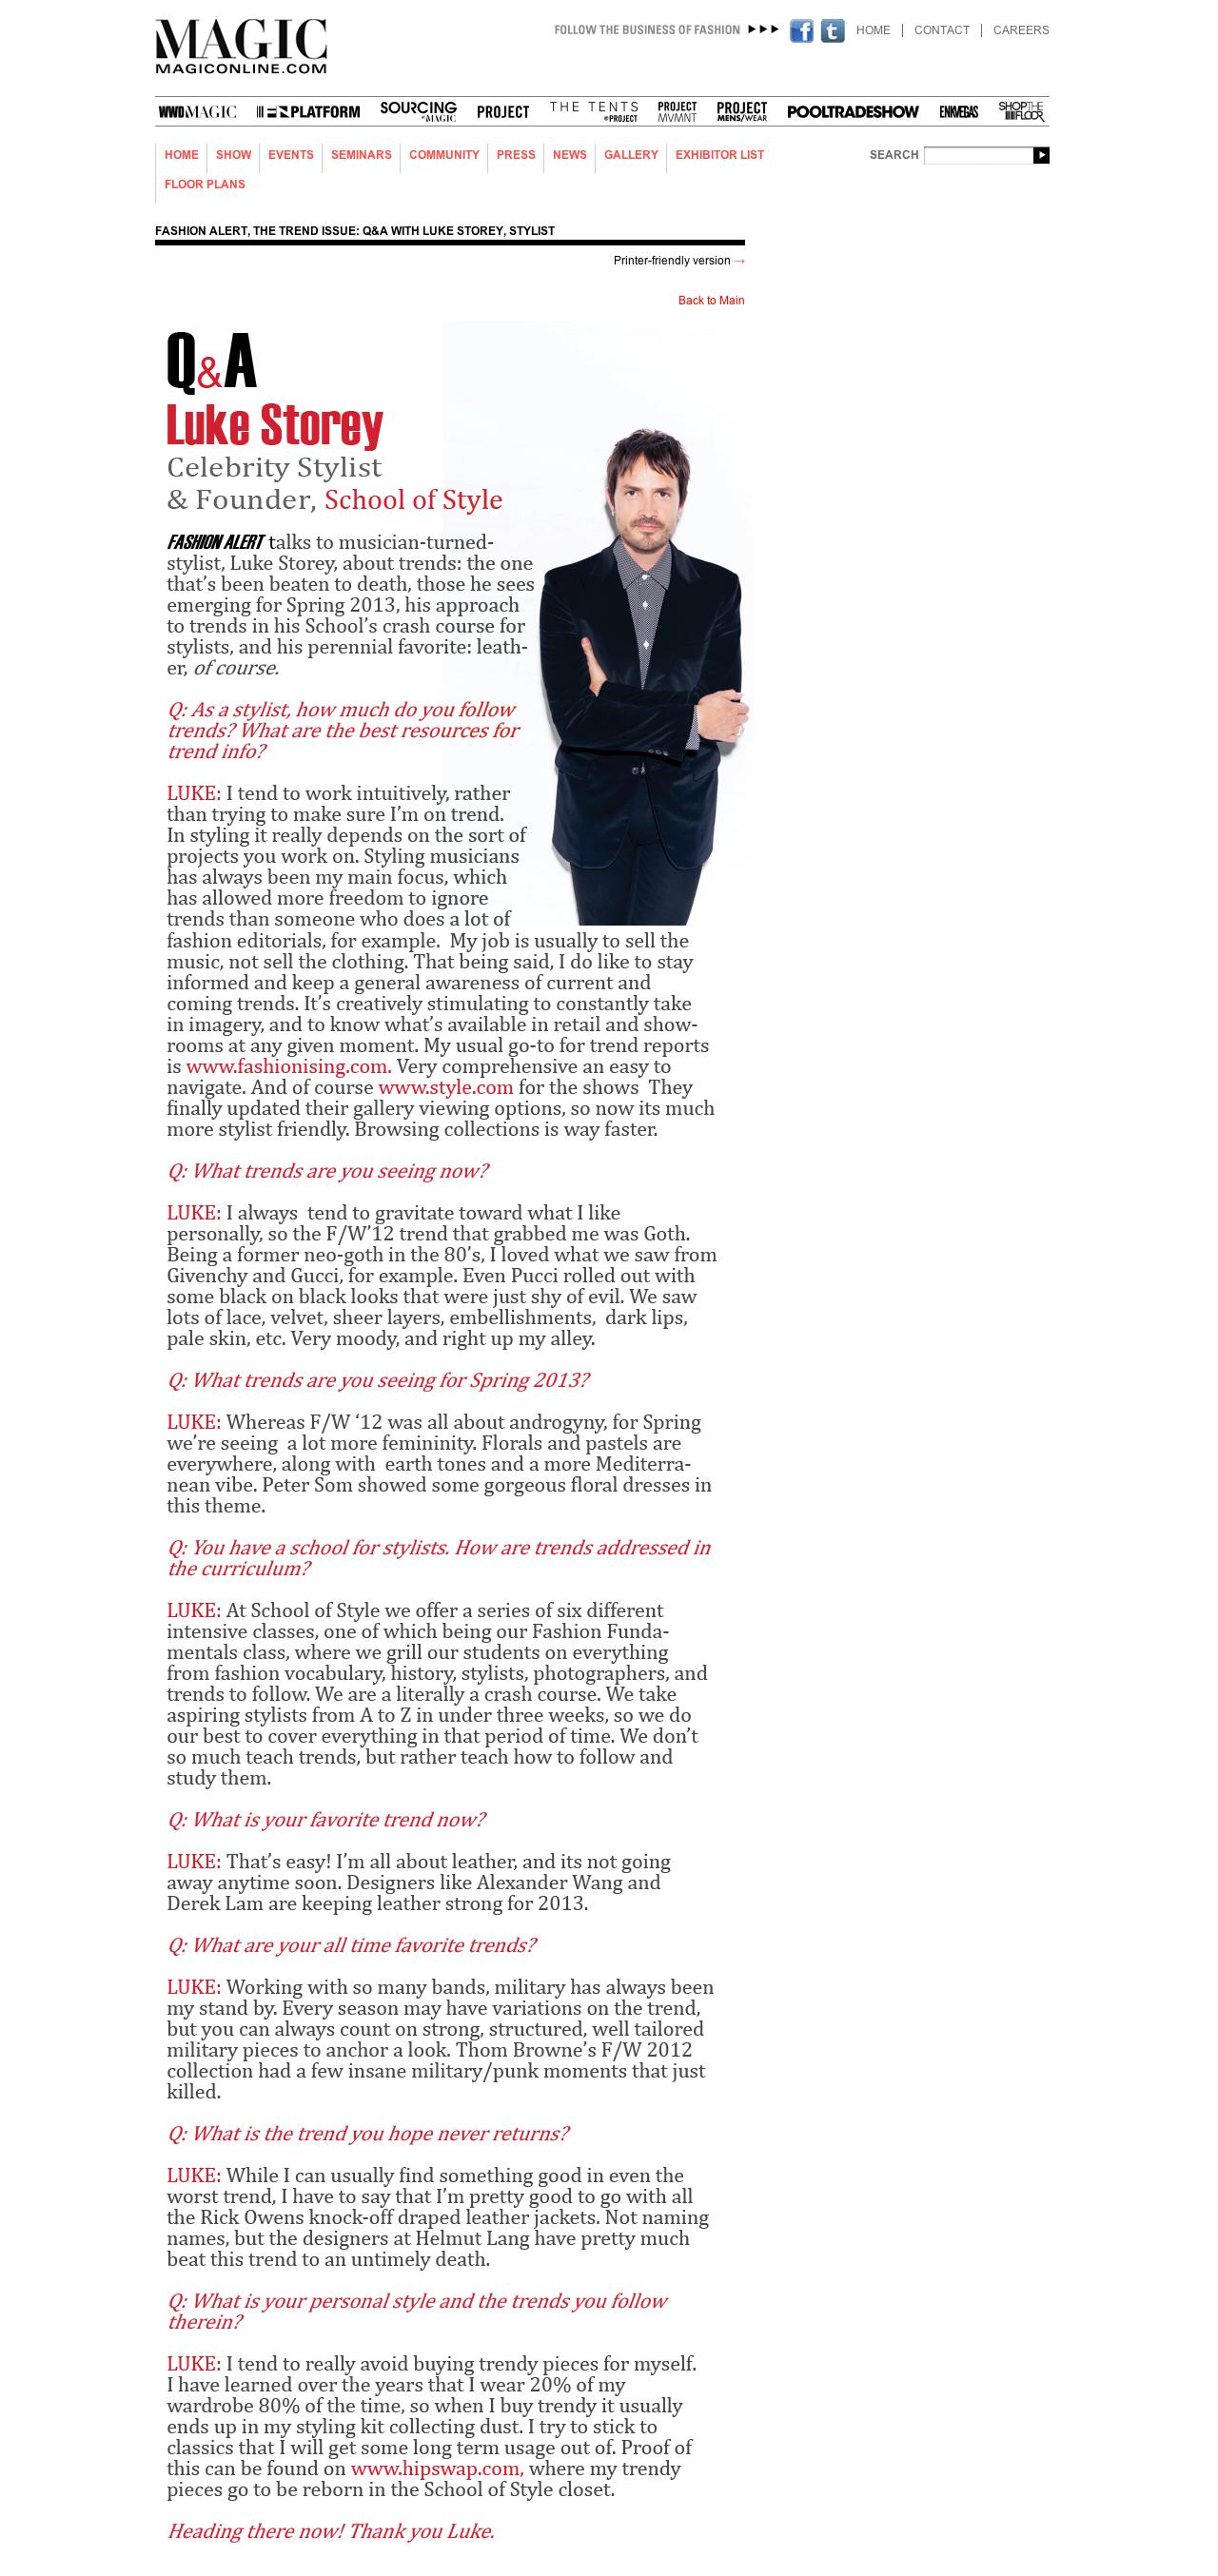 press_article-Magic.jpg